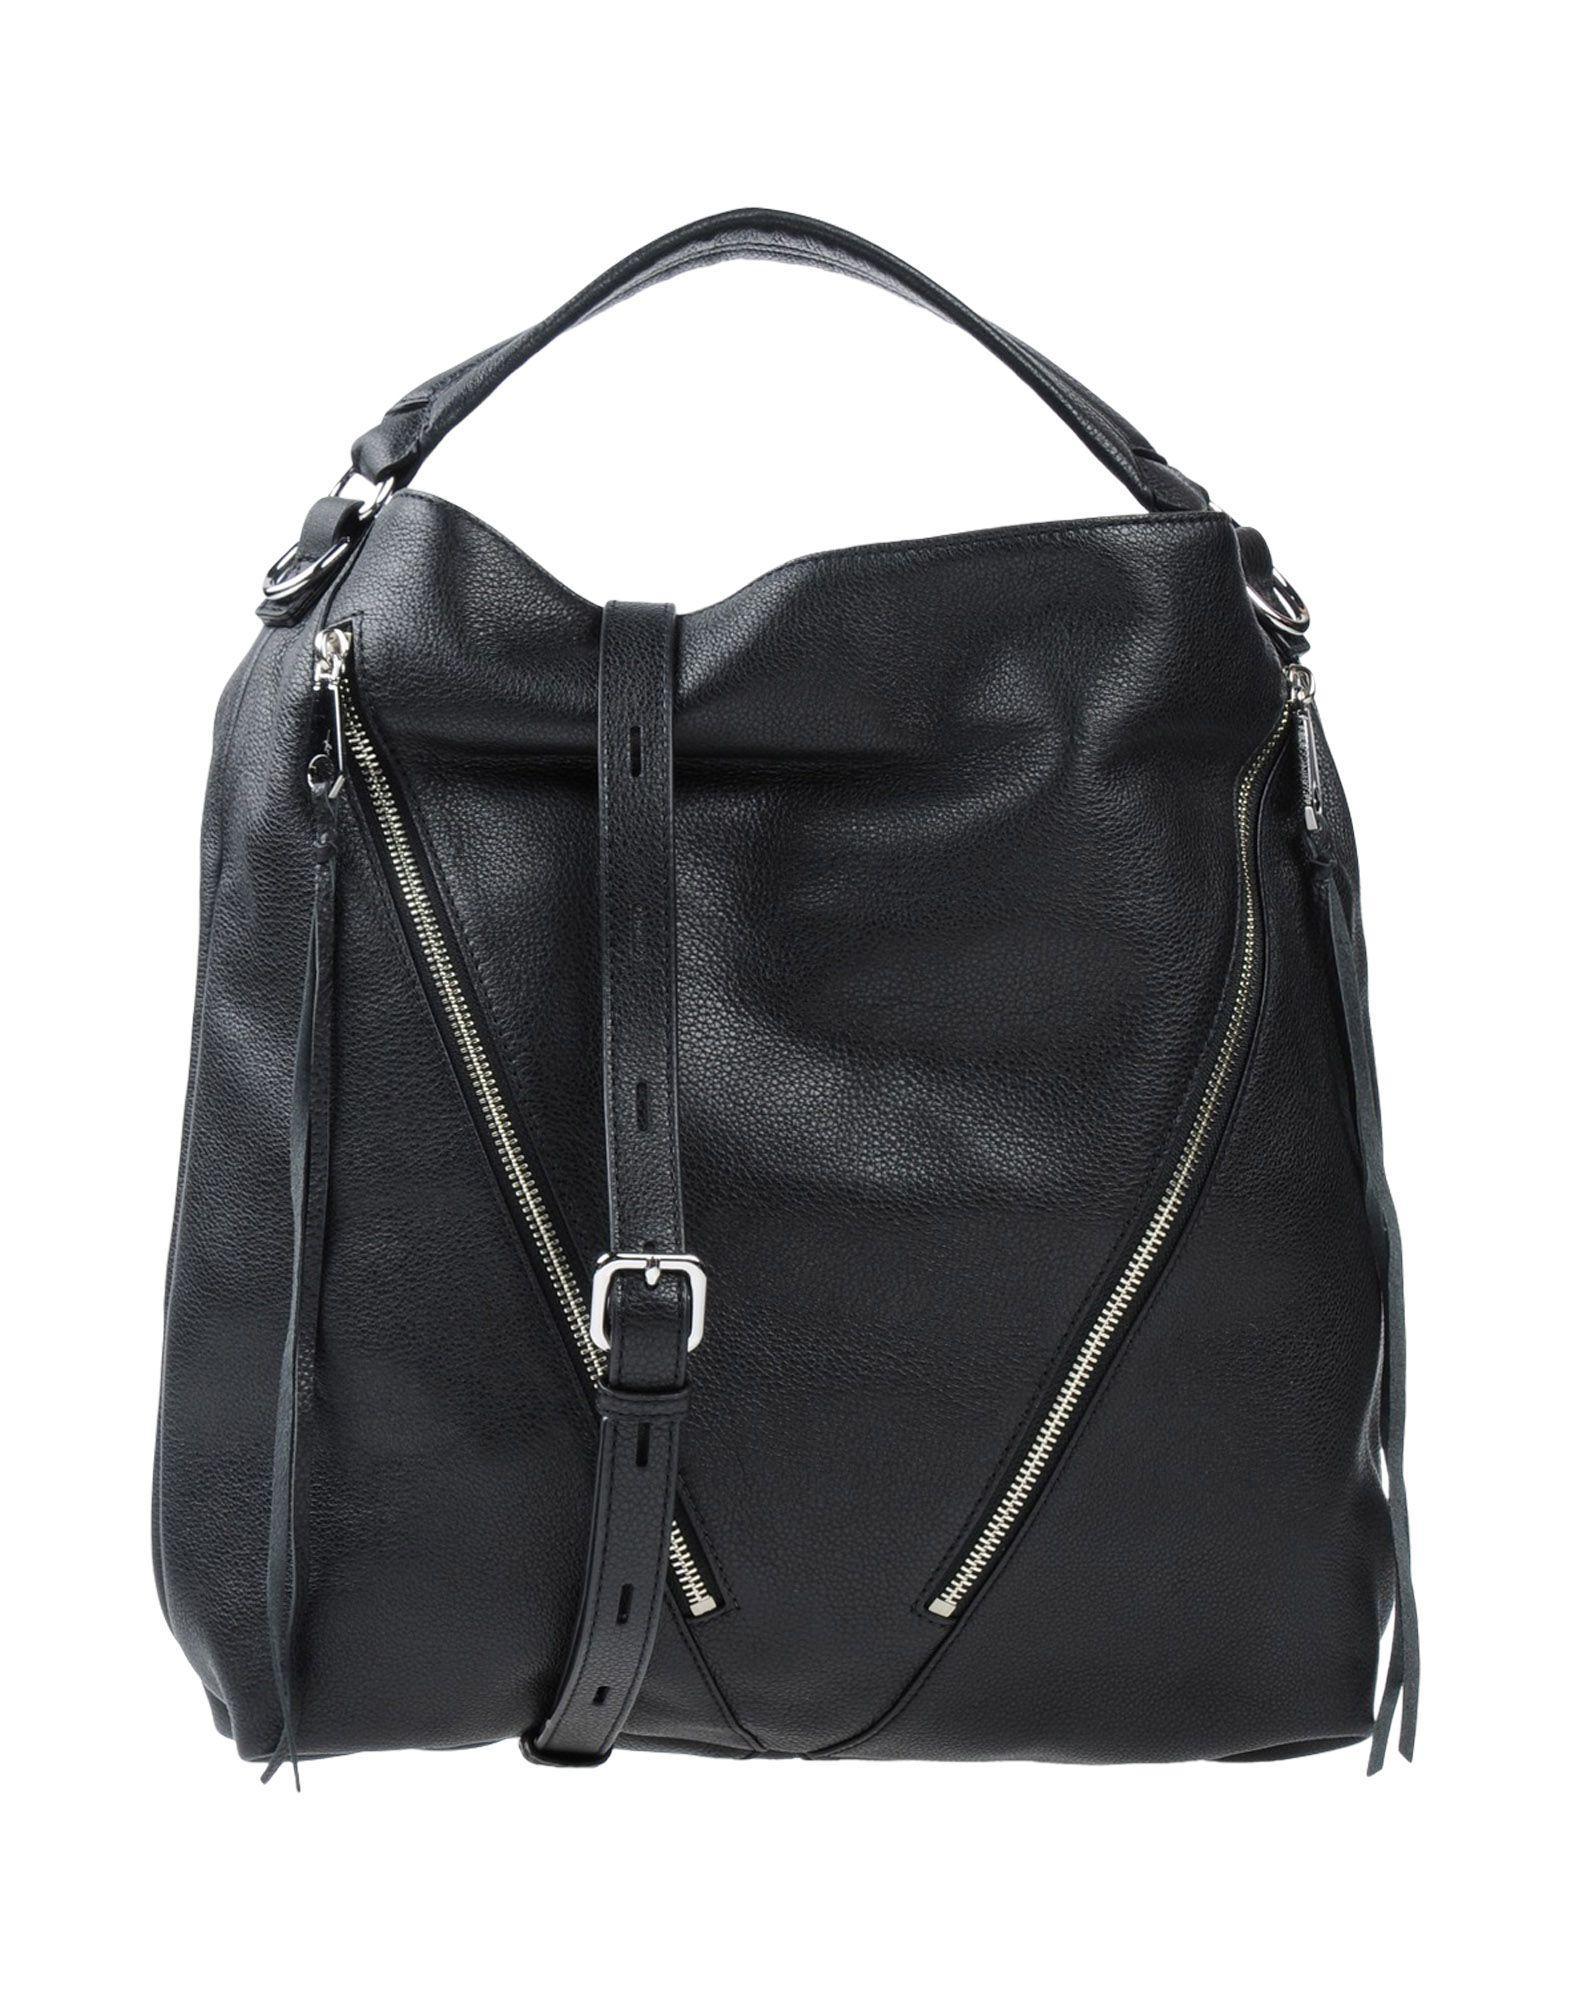 Rebecca Minkoff Handbag In Black